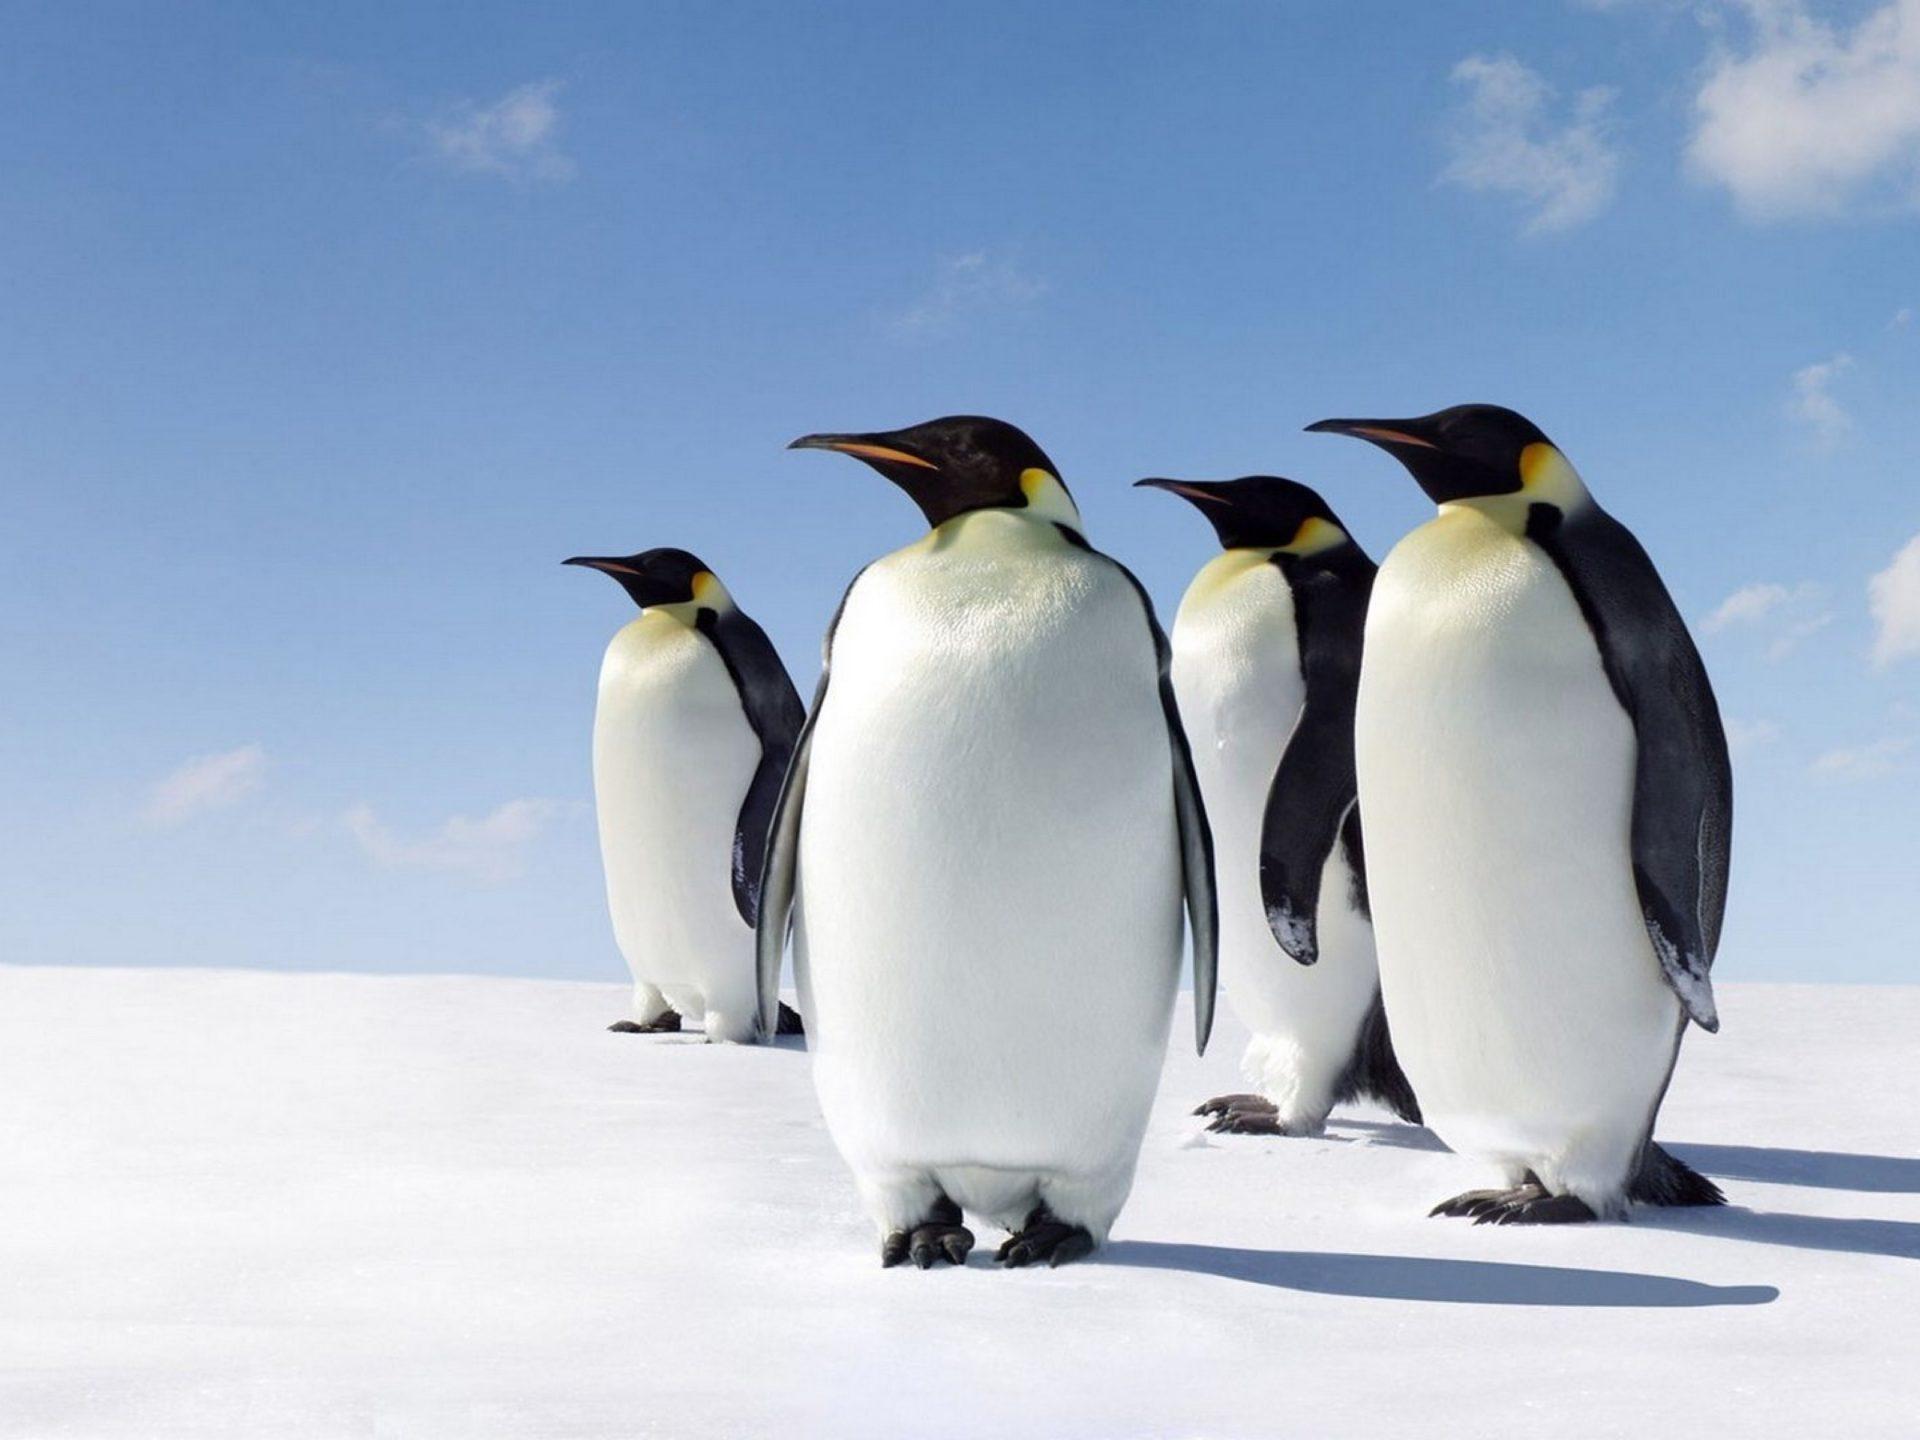 White Iphone 5 Wallpaper Hd Penguins Morning Sun Antarctica Desktop Hd Wallpaper For